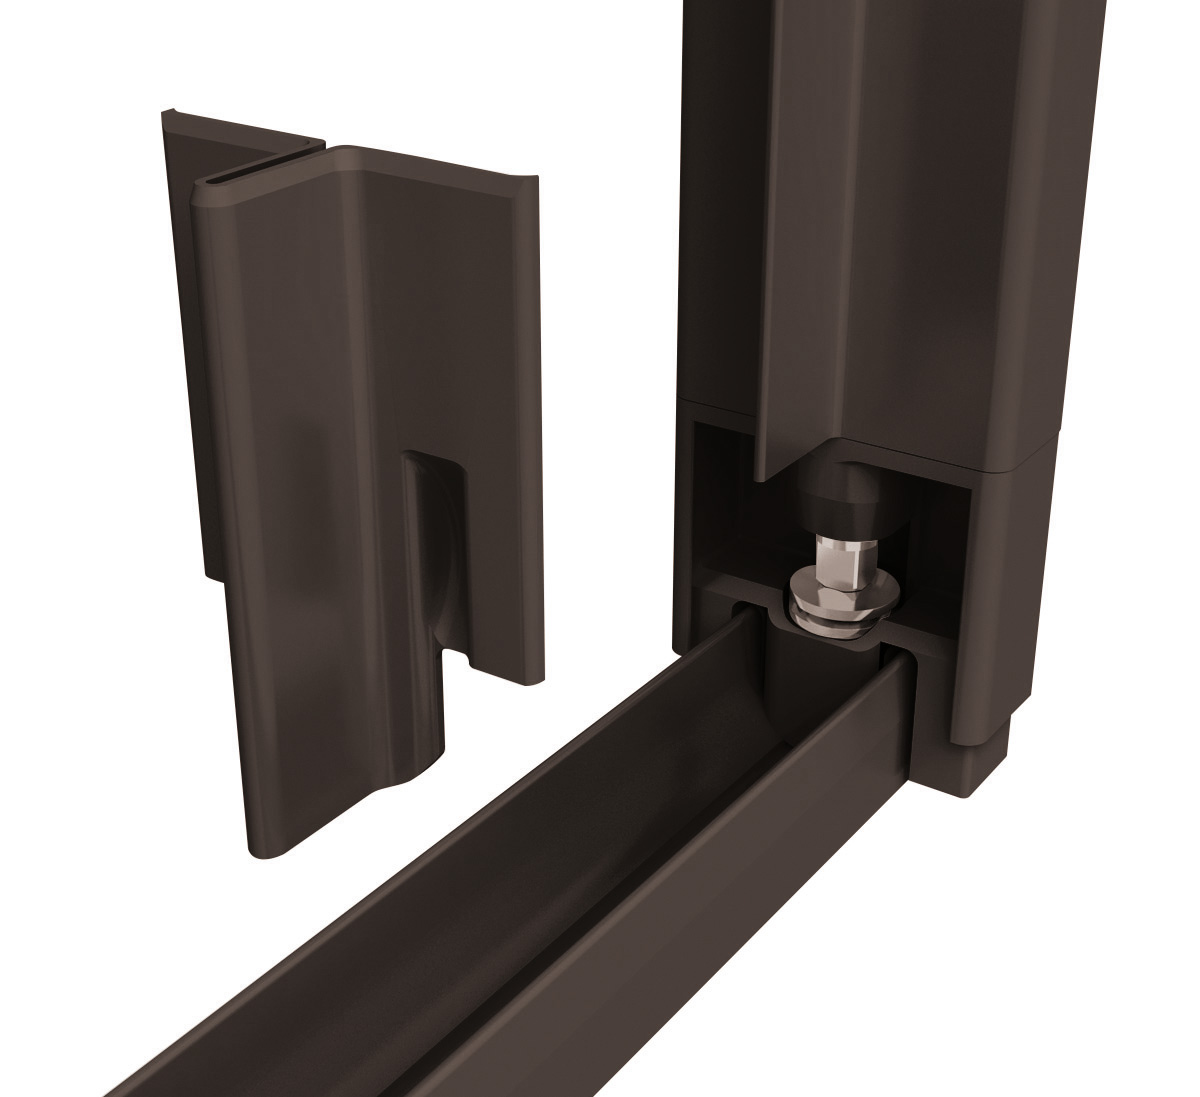 insektenschutz t r doppelschiebet r 230x240cm grau. Black Bedroom Furniture Sets. Home Design Ideas